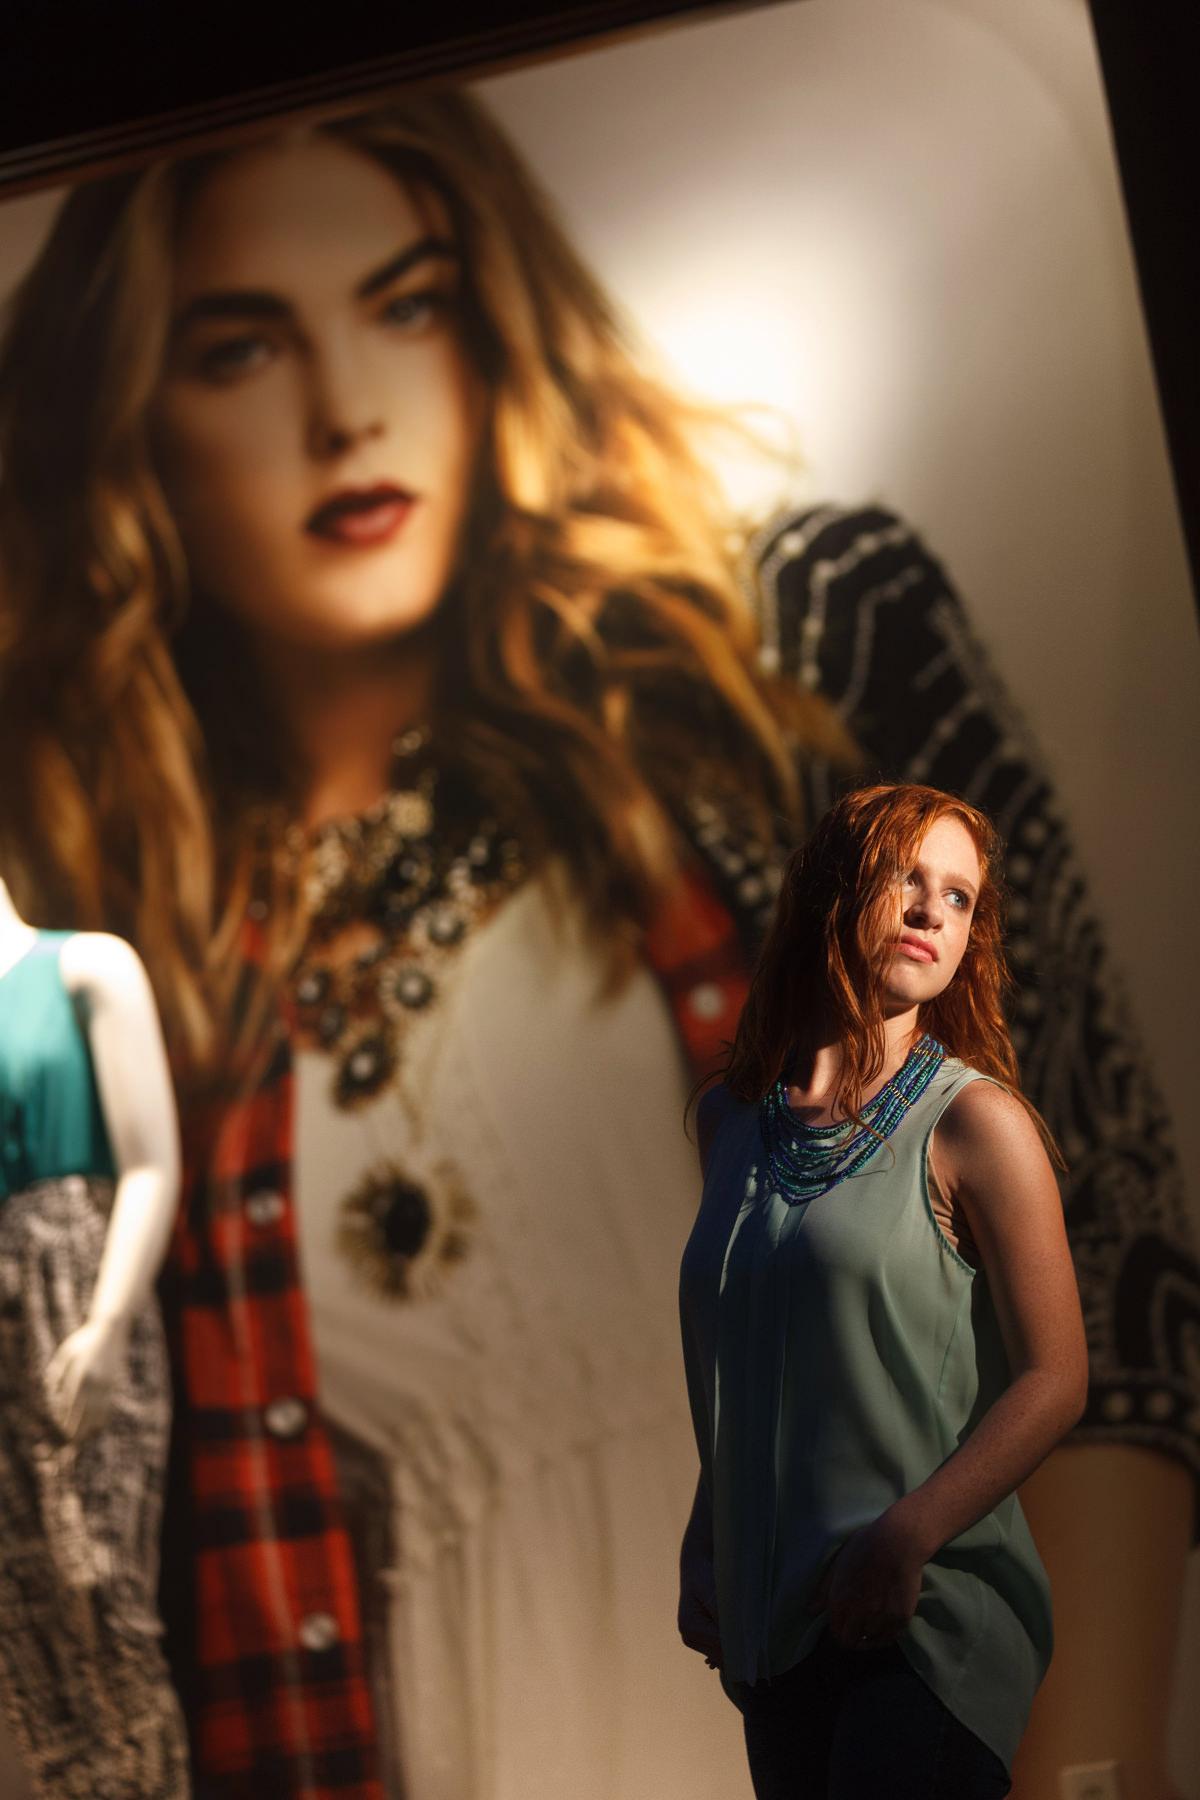 charleston senior portrait photographers_39